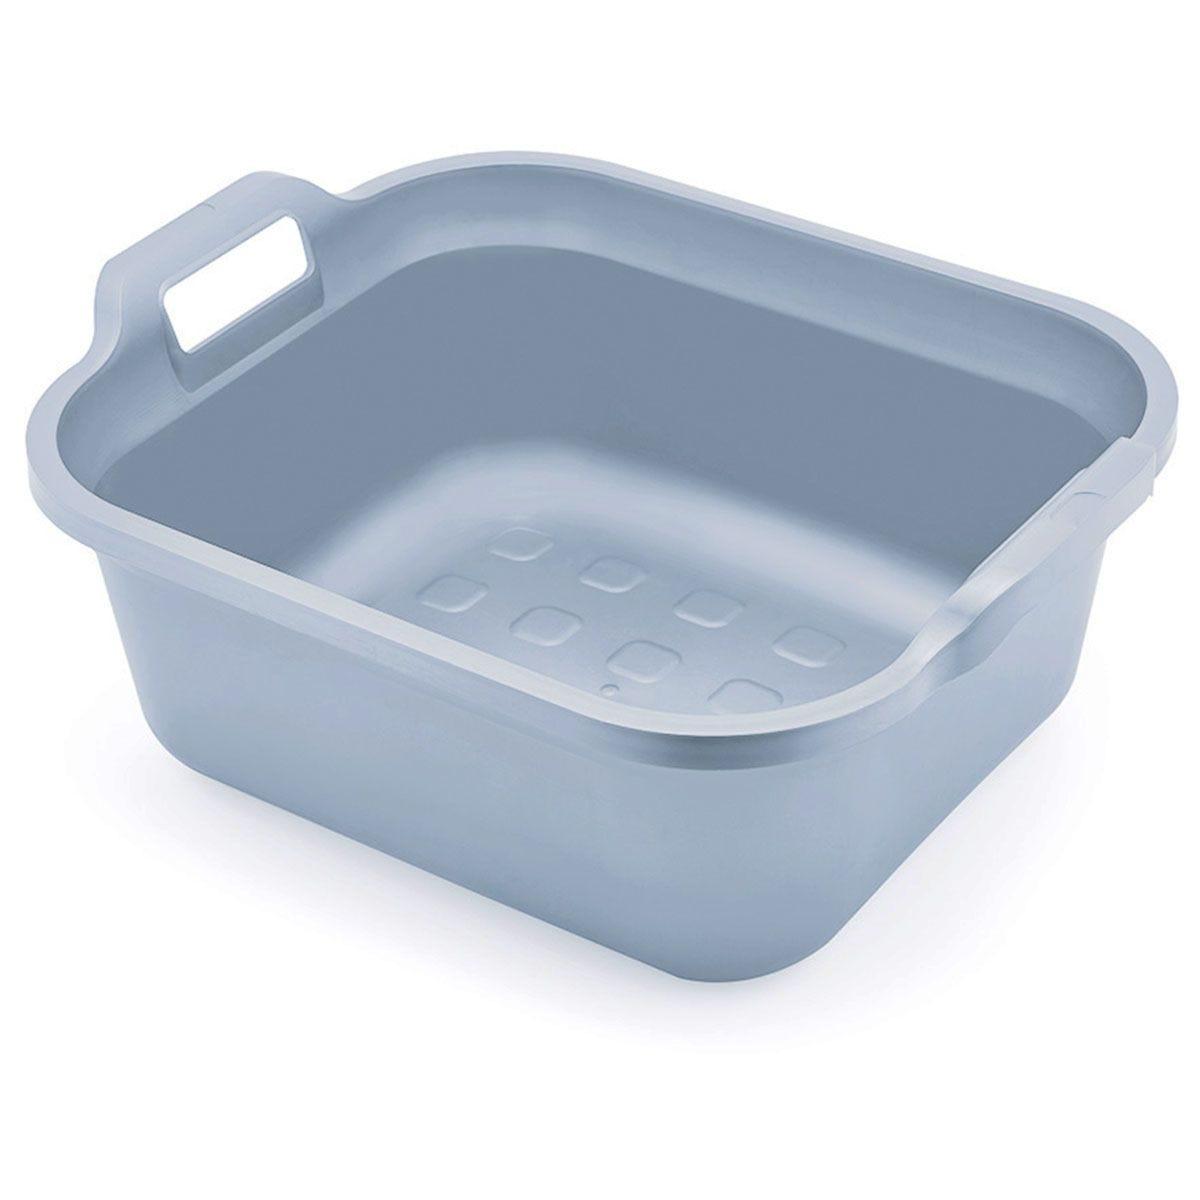 Addis 10L Washing Up Bowl - Grey